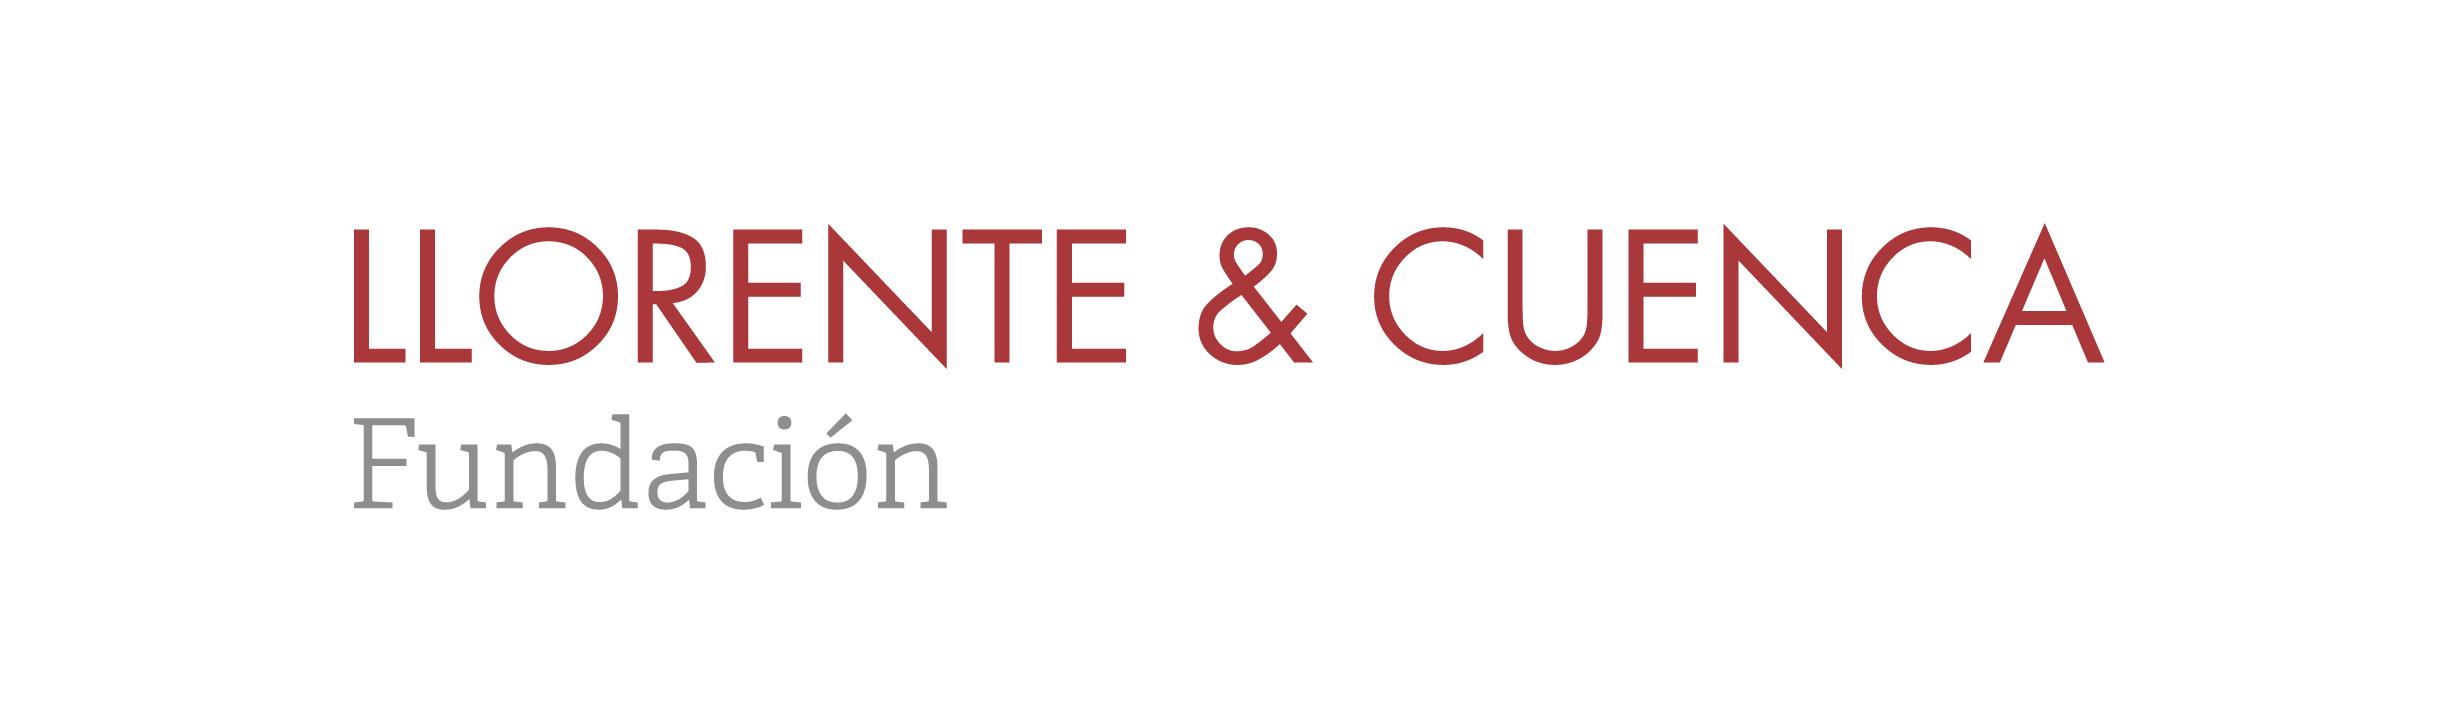 Logos_Fundacion